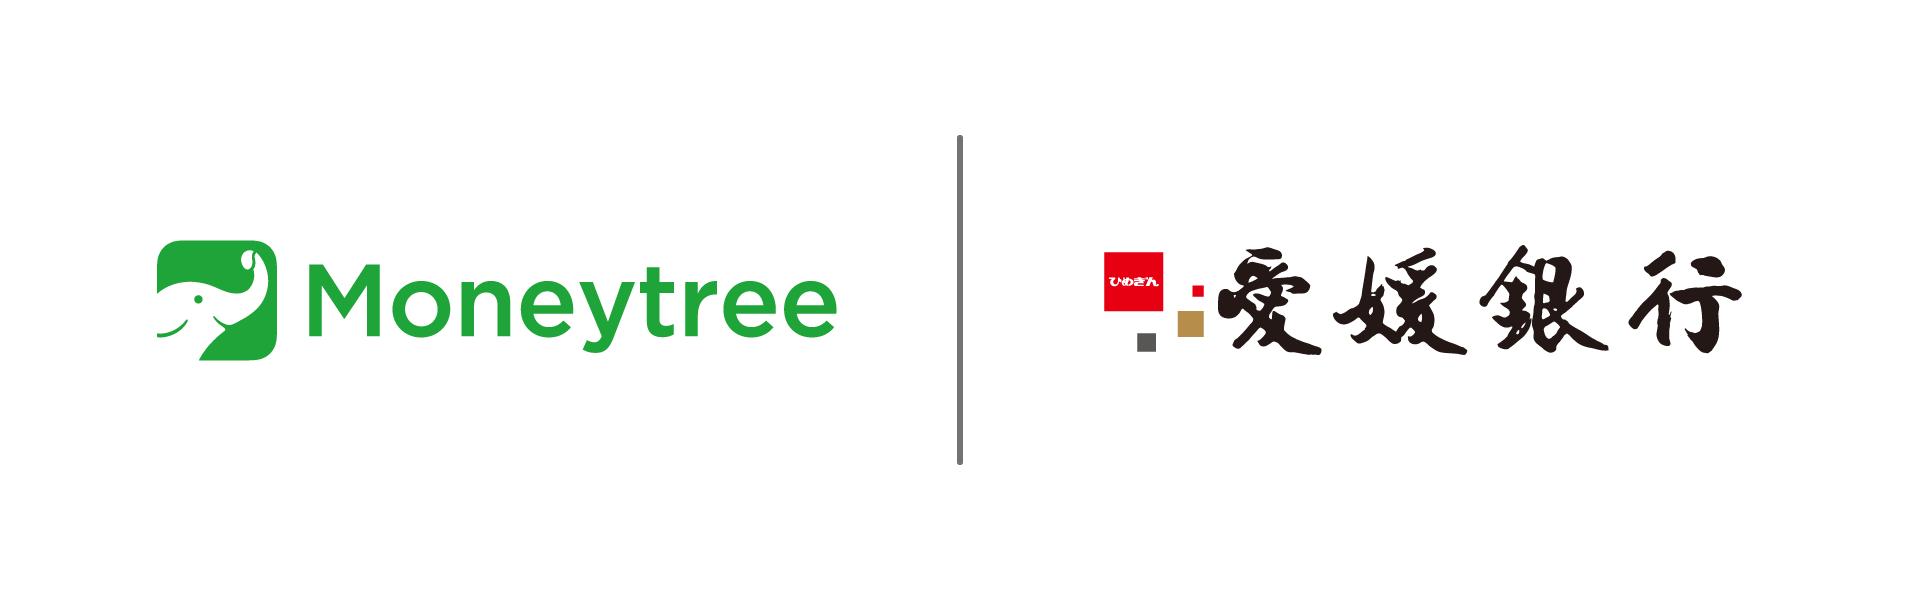 PressRelease EhimeBank Logo